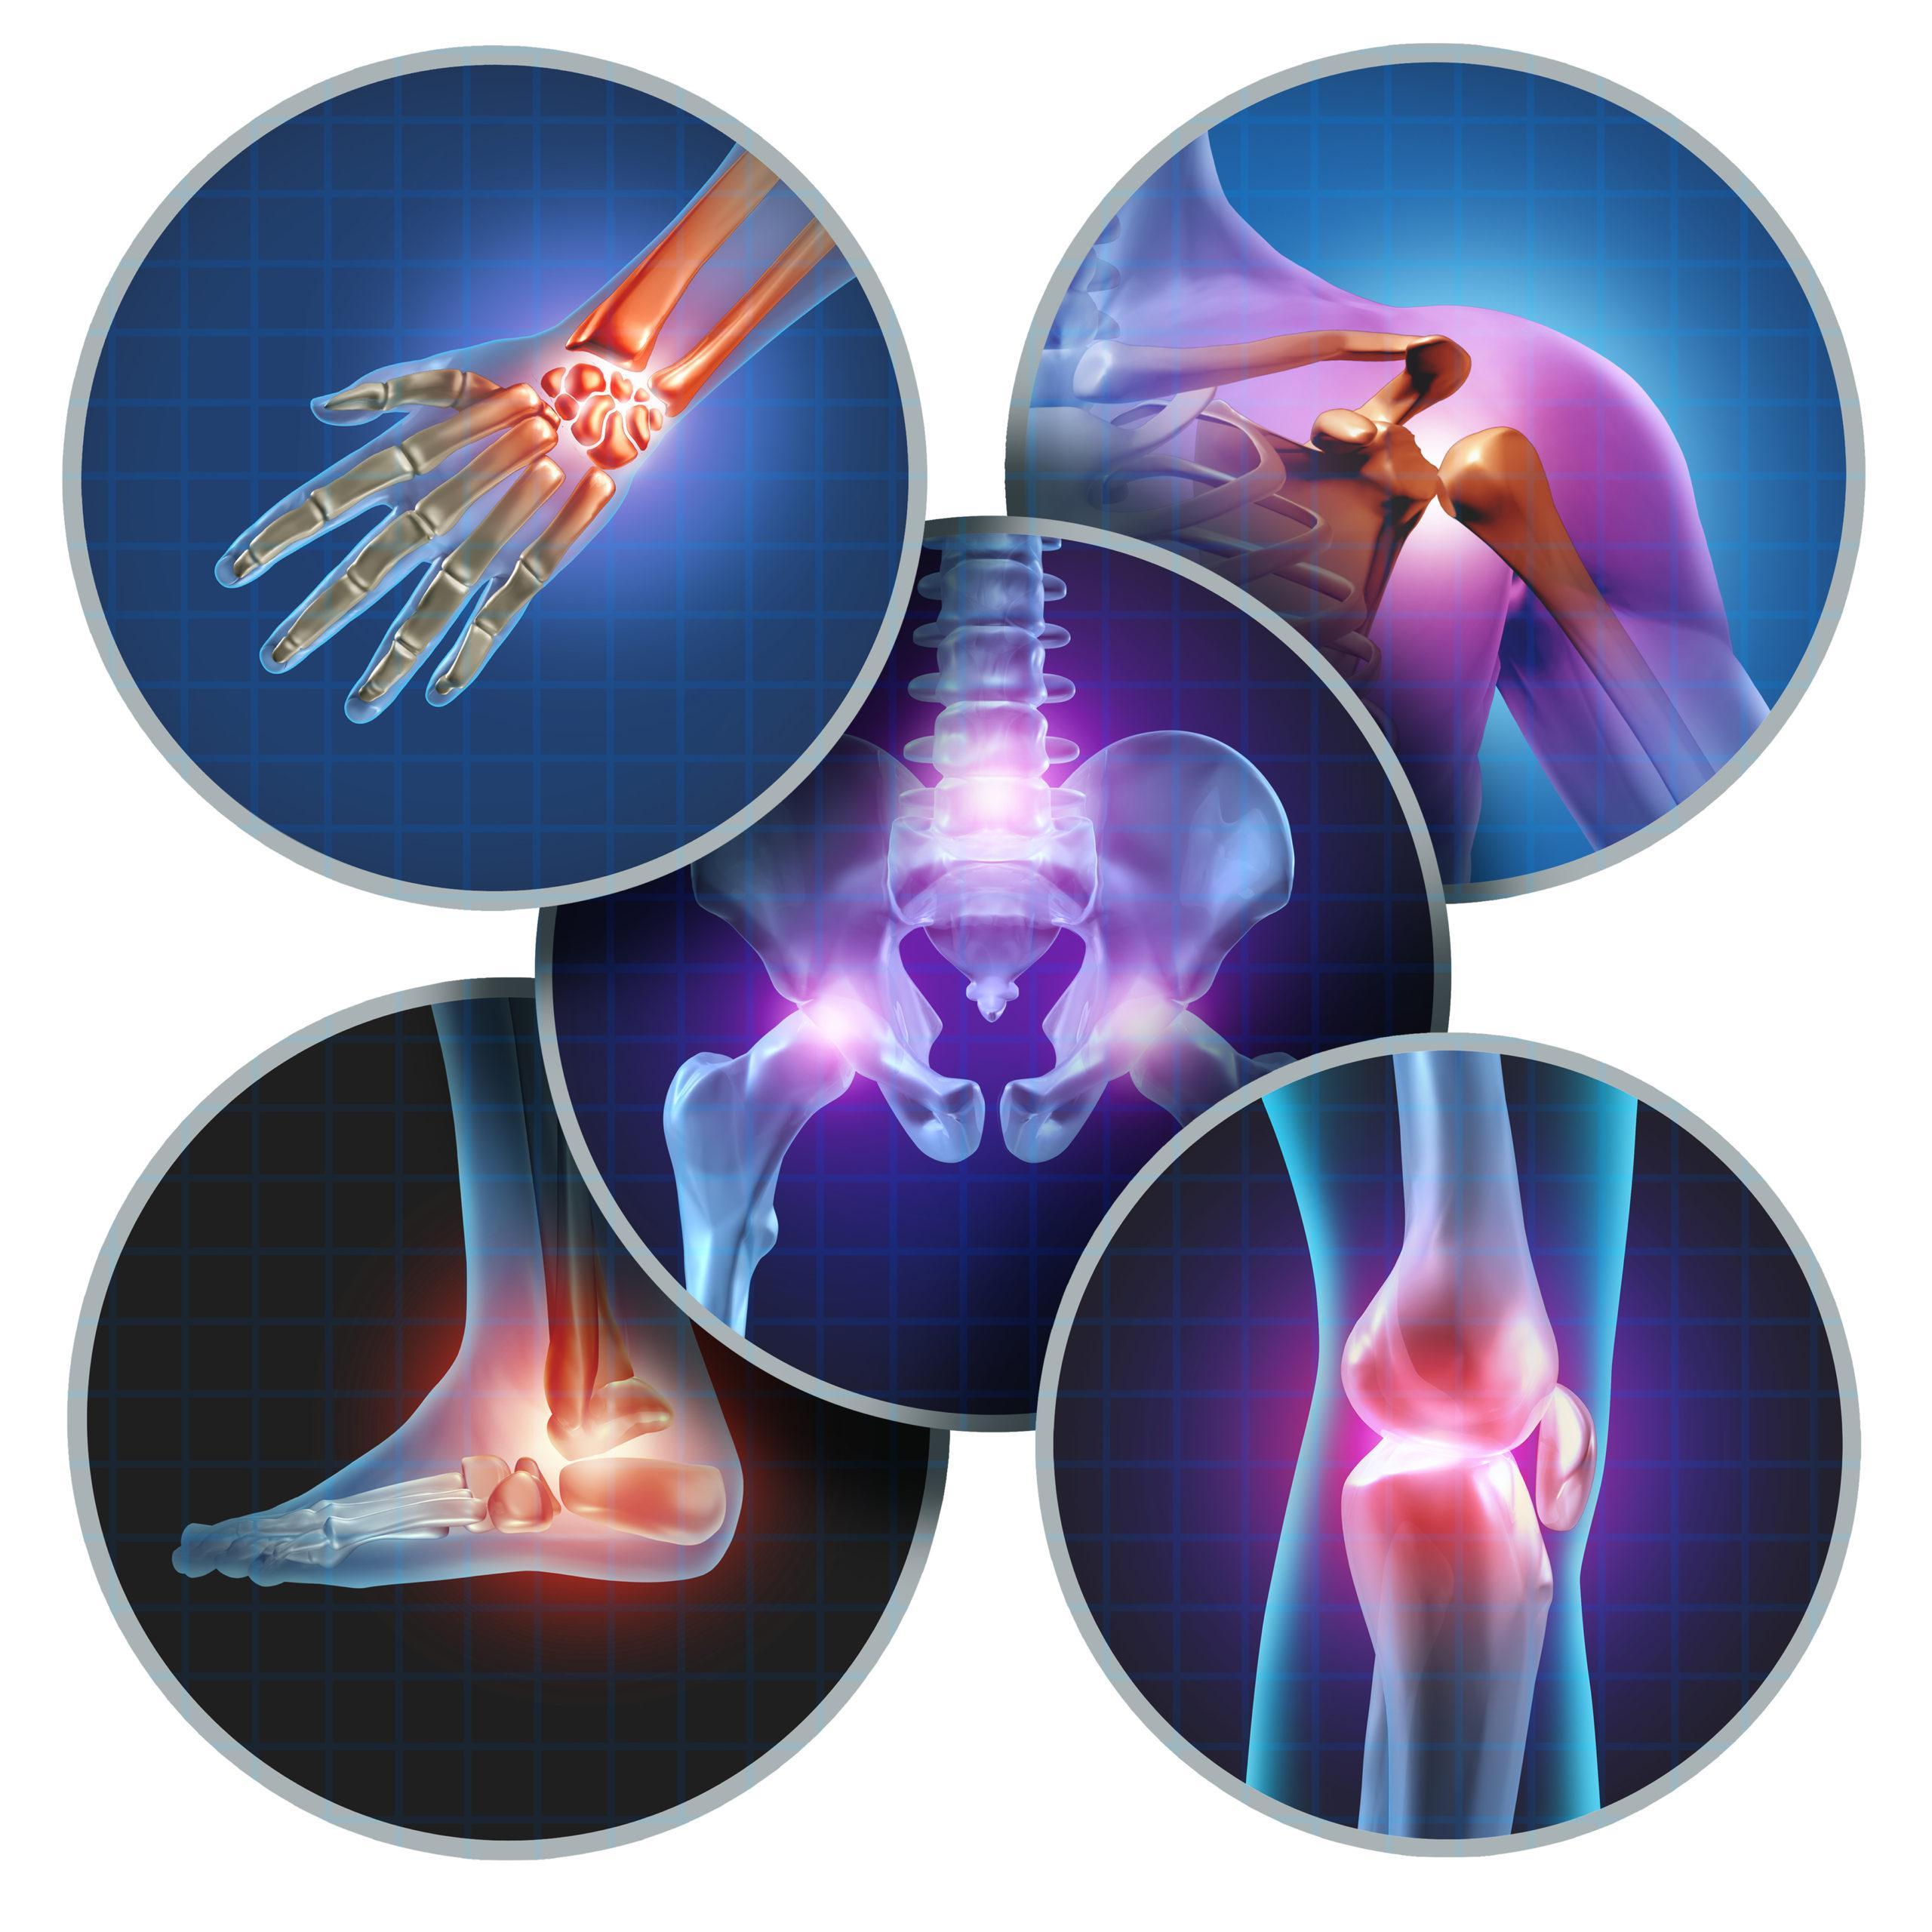 dureri articulare cu creștere